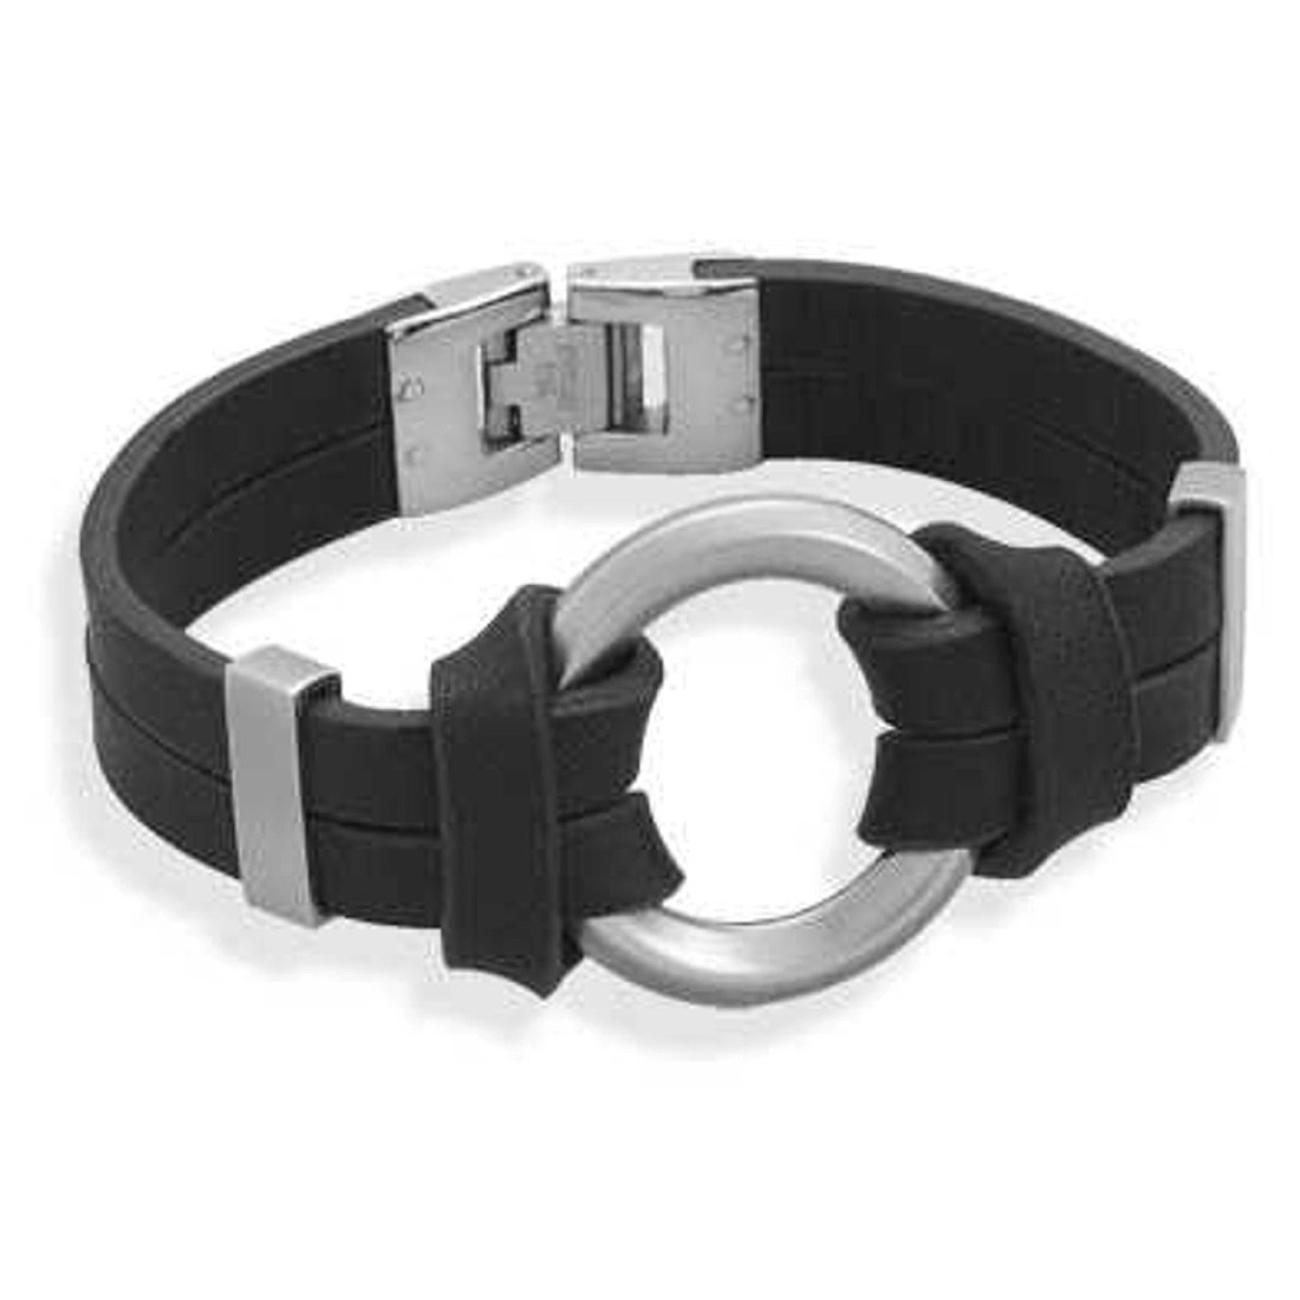 Stainless Steel Circle Ring Black Leather Bracelet Bella